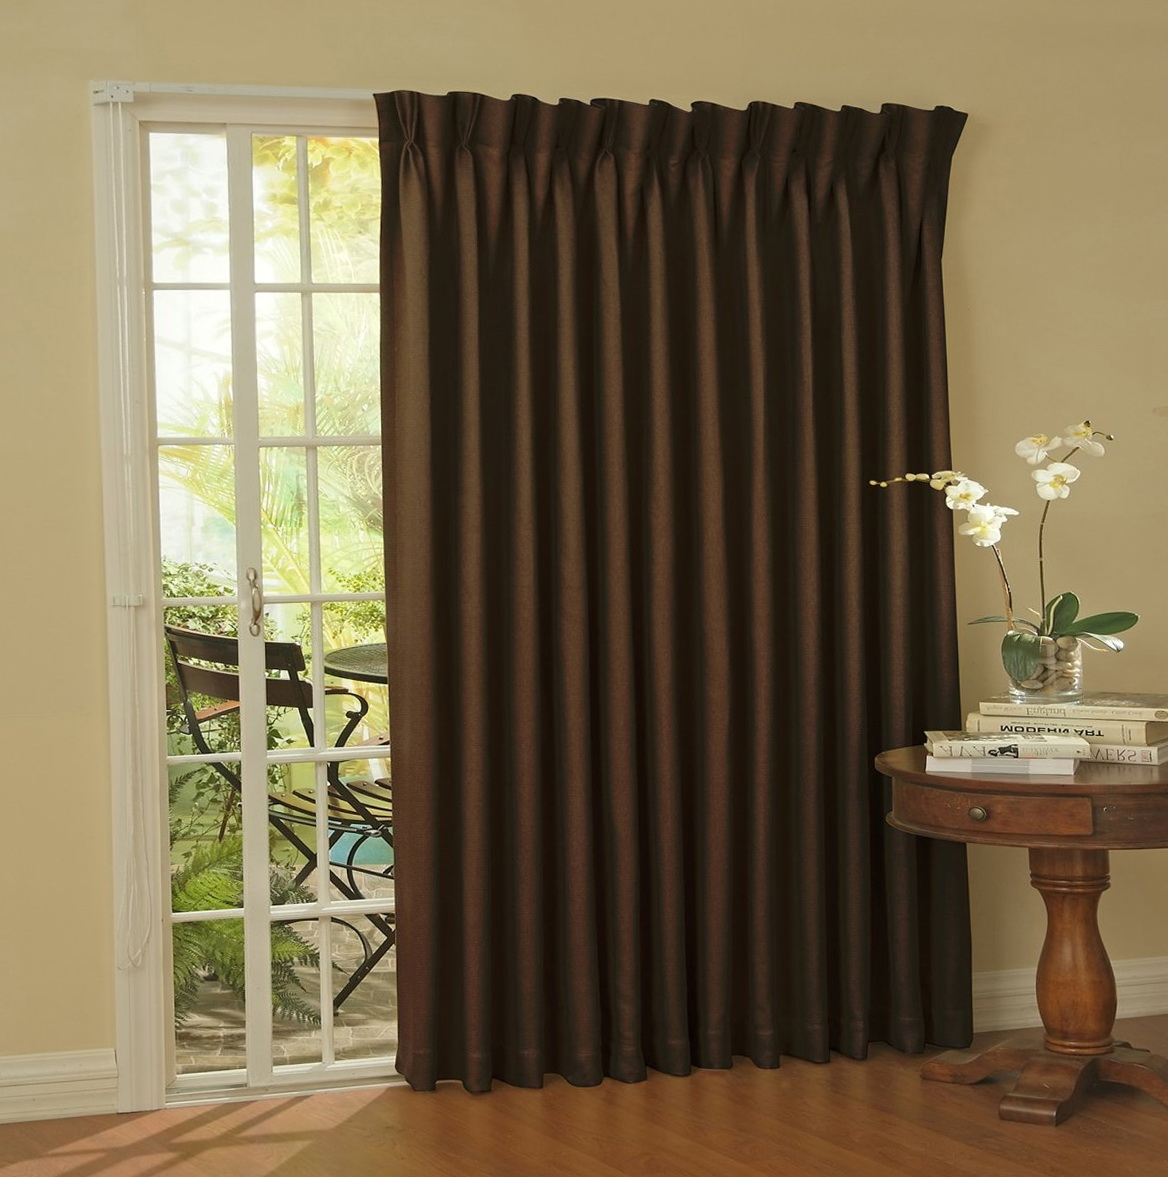 Sliding Door Curtain Ideas